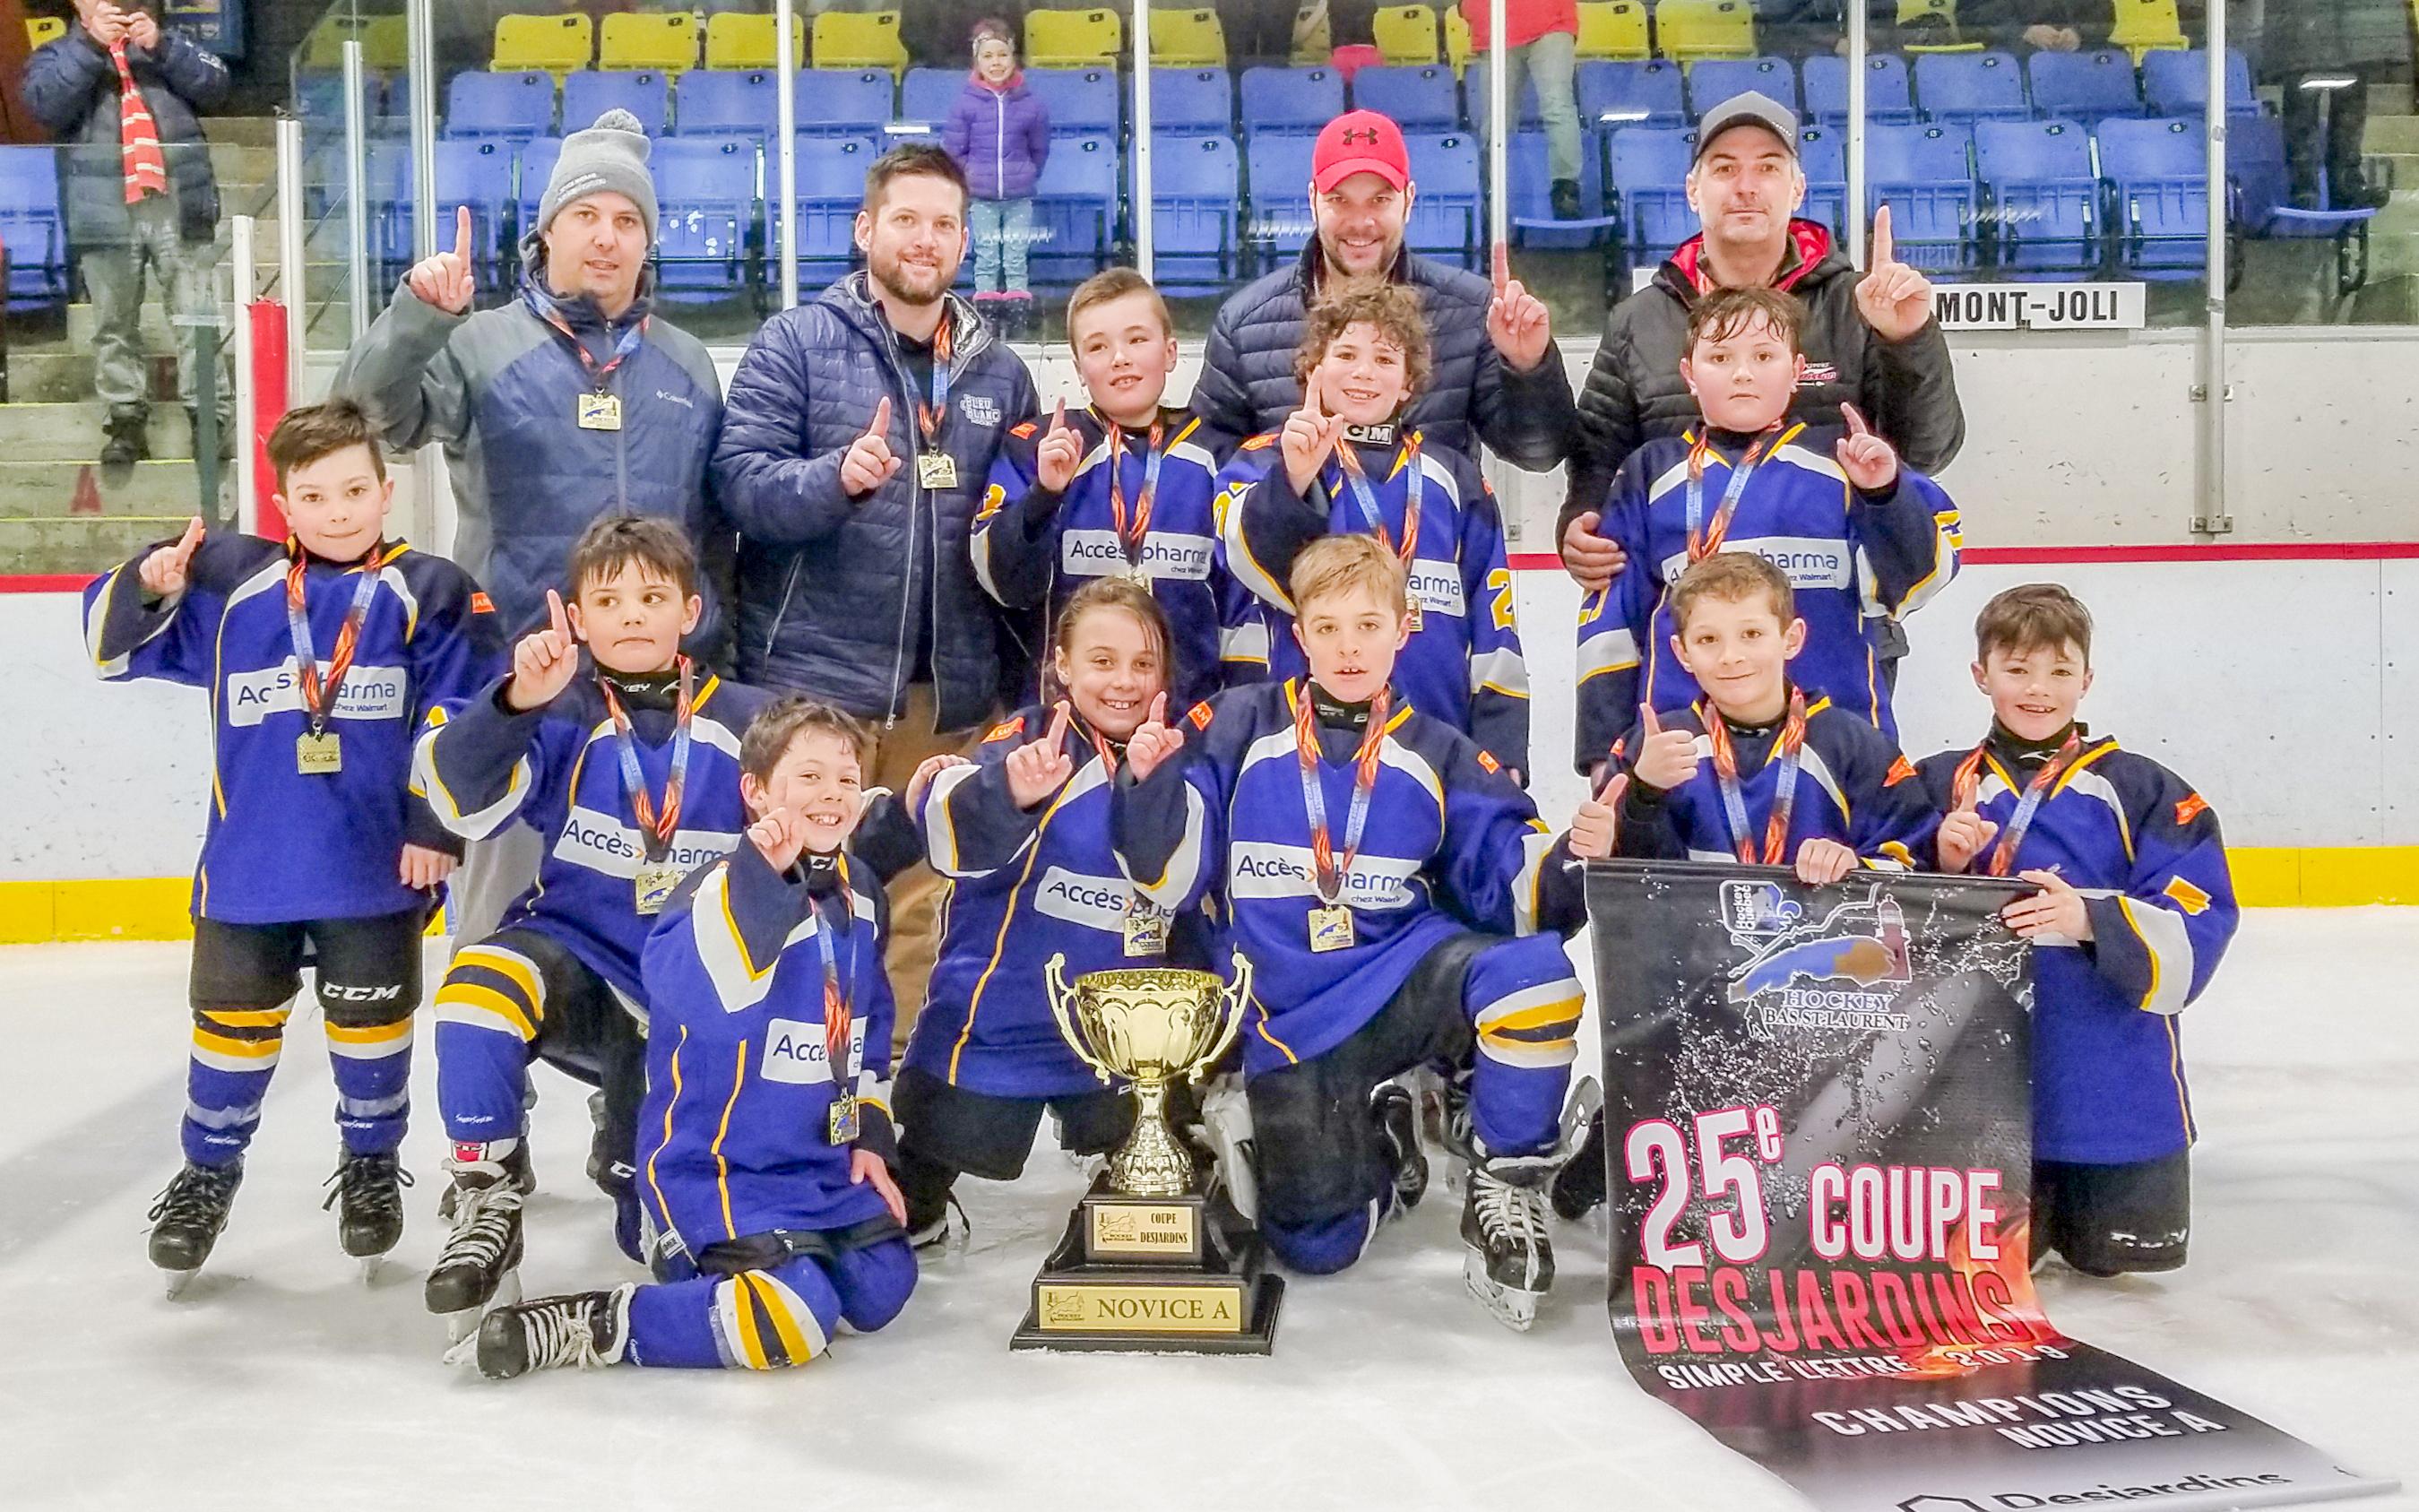 Coupe Desjardins hockey simple lettre Matane Accès pharma